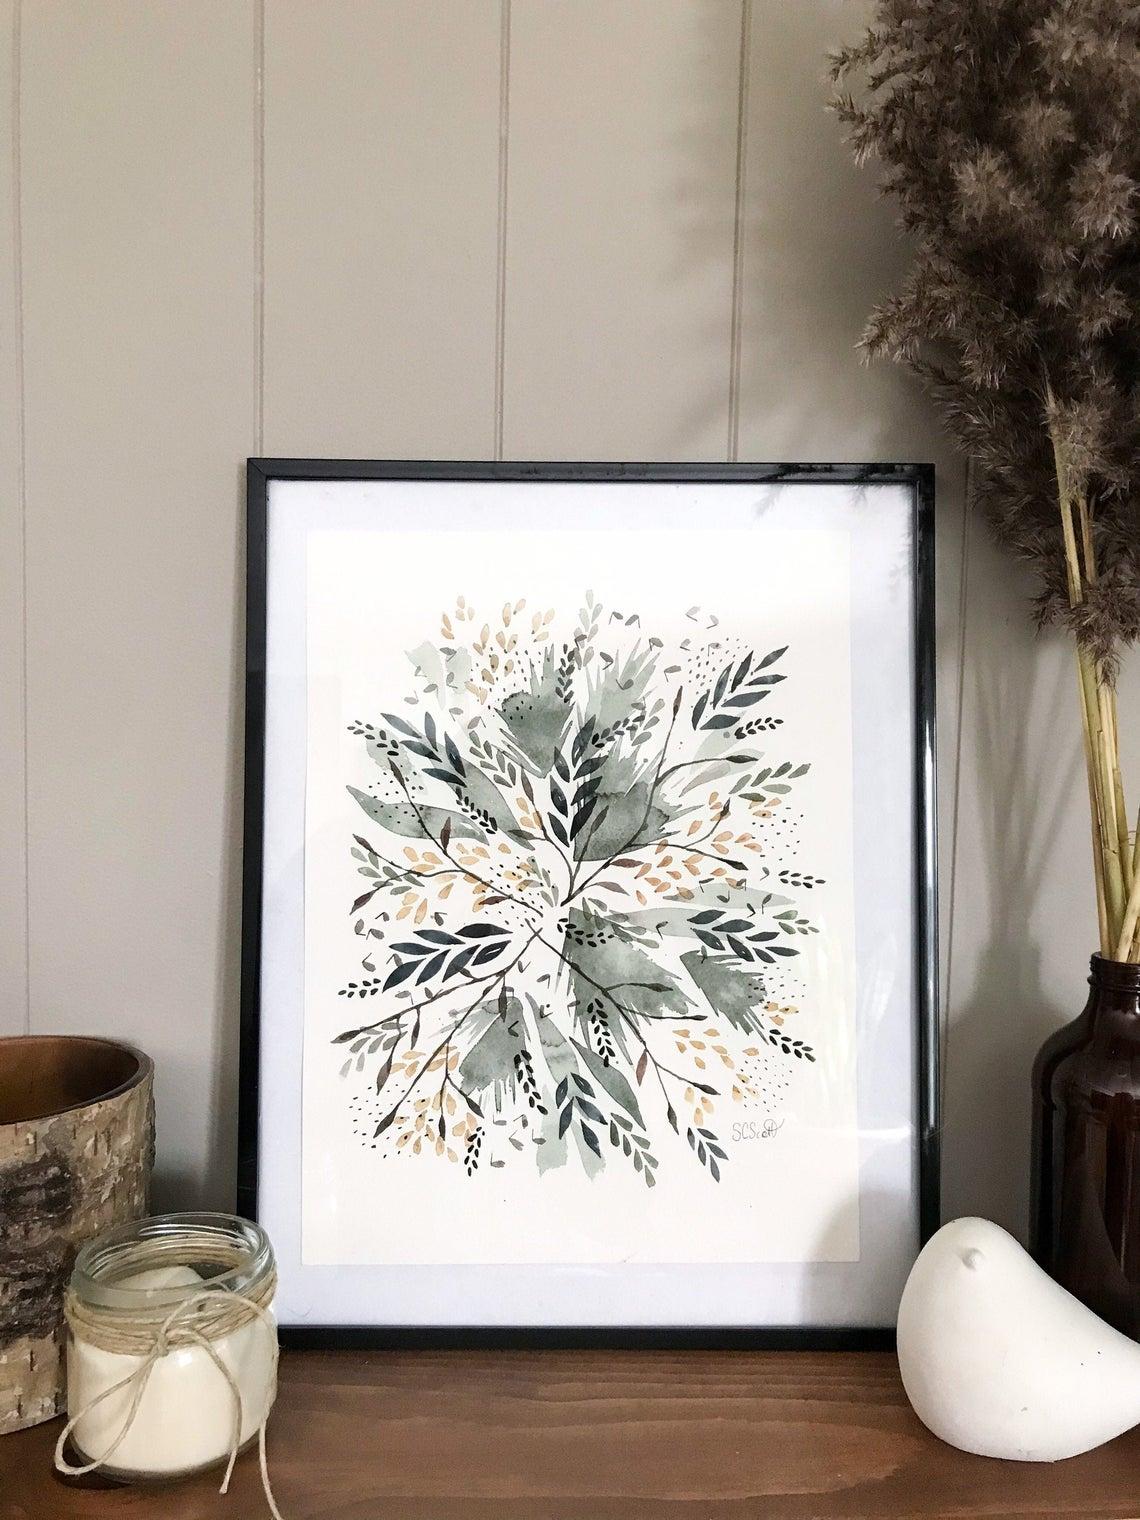 Paysage abstrait hivernal